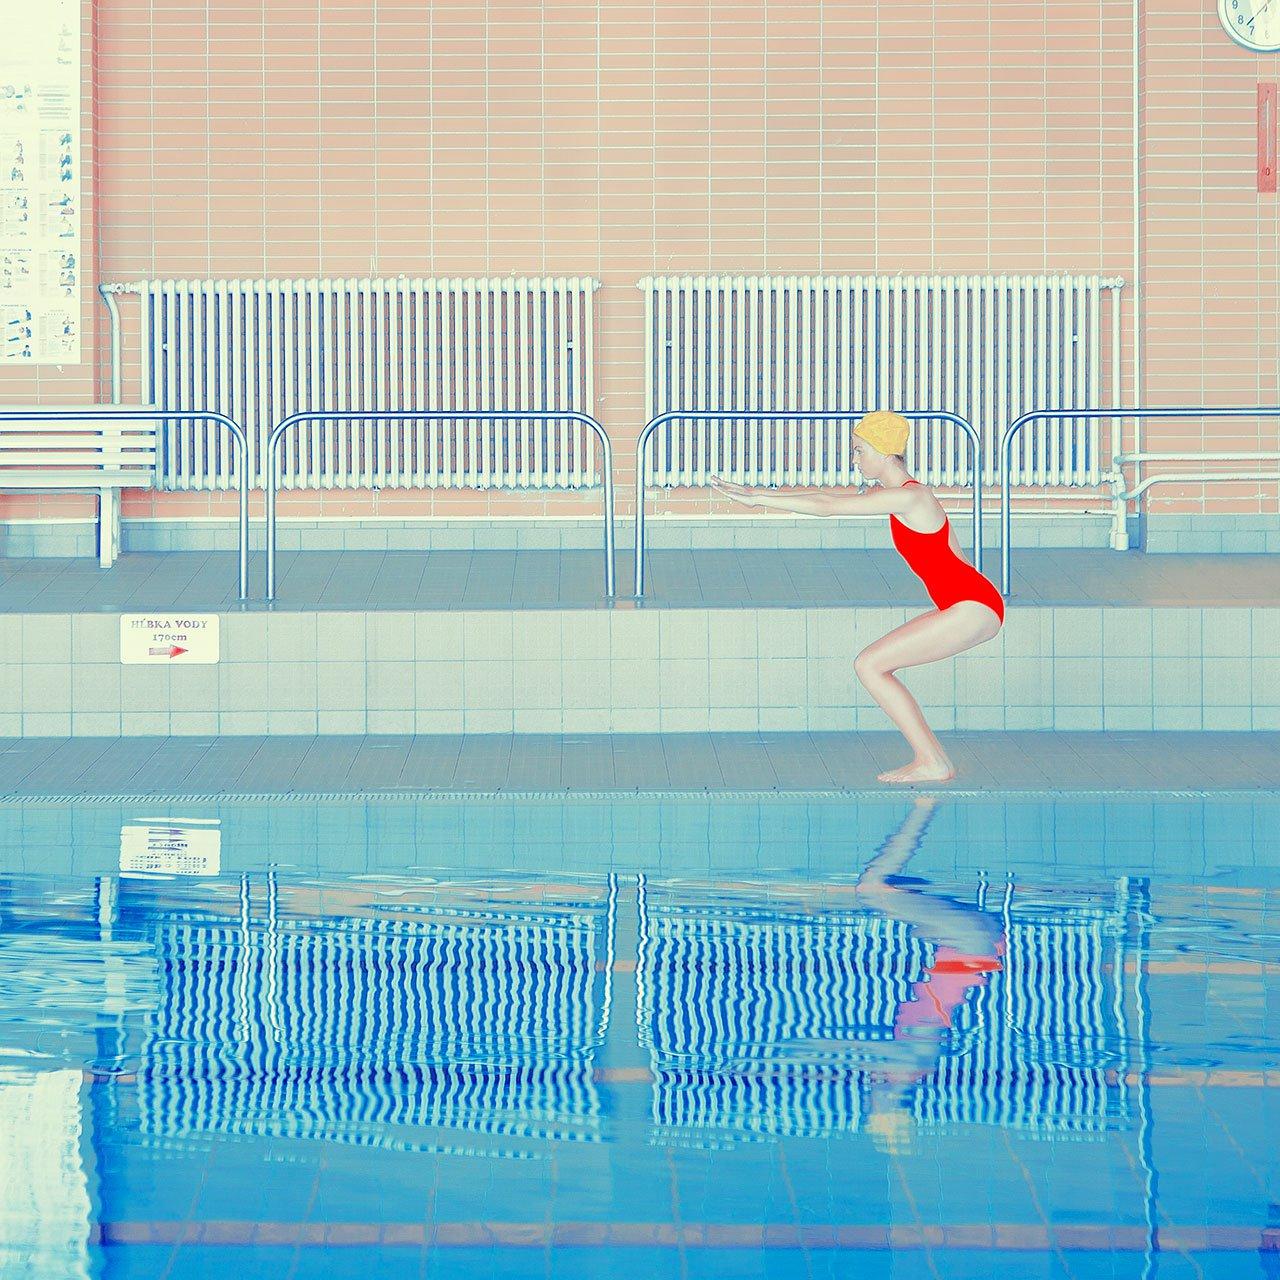 f6_maria_svarbova_swimm_series_yatzer (1).jpg